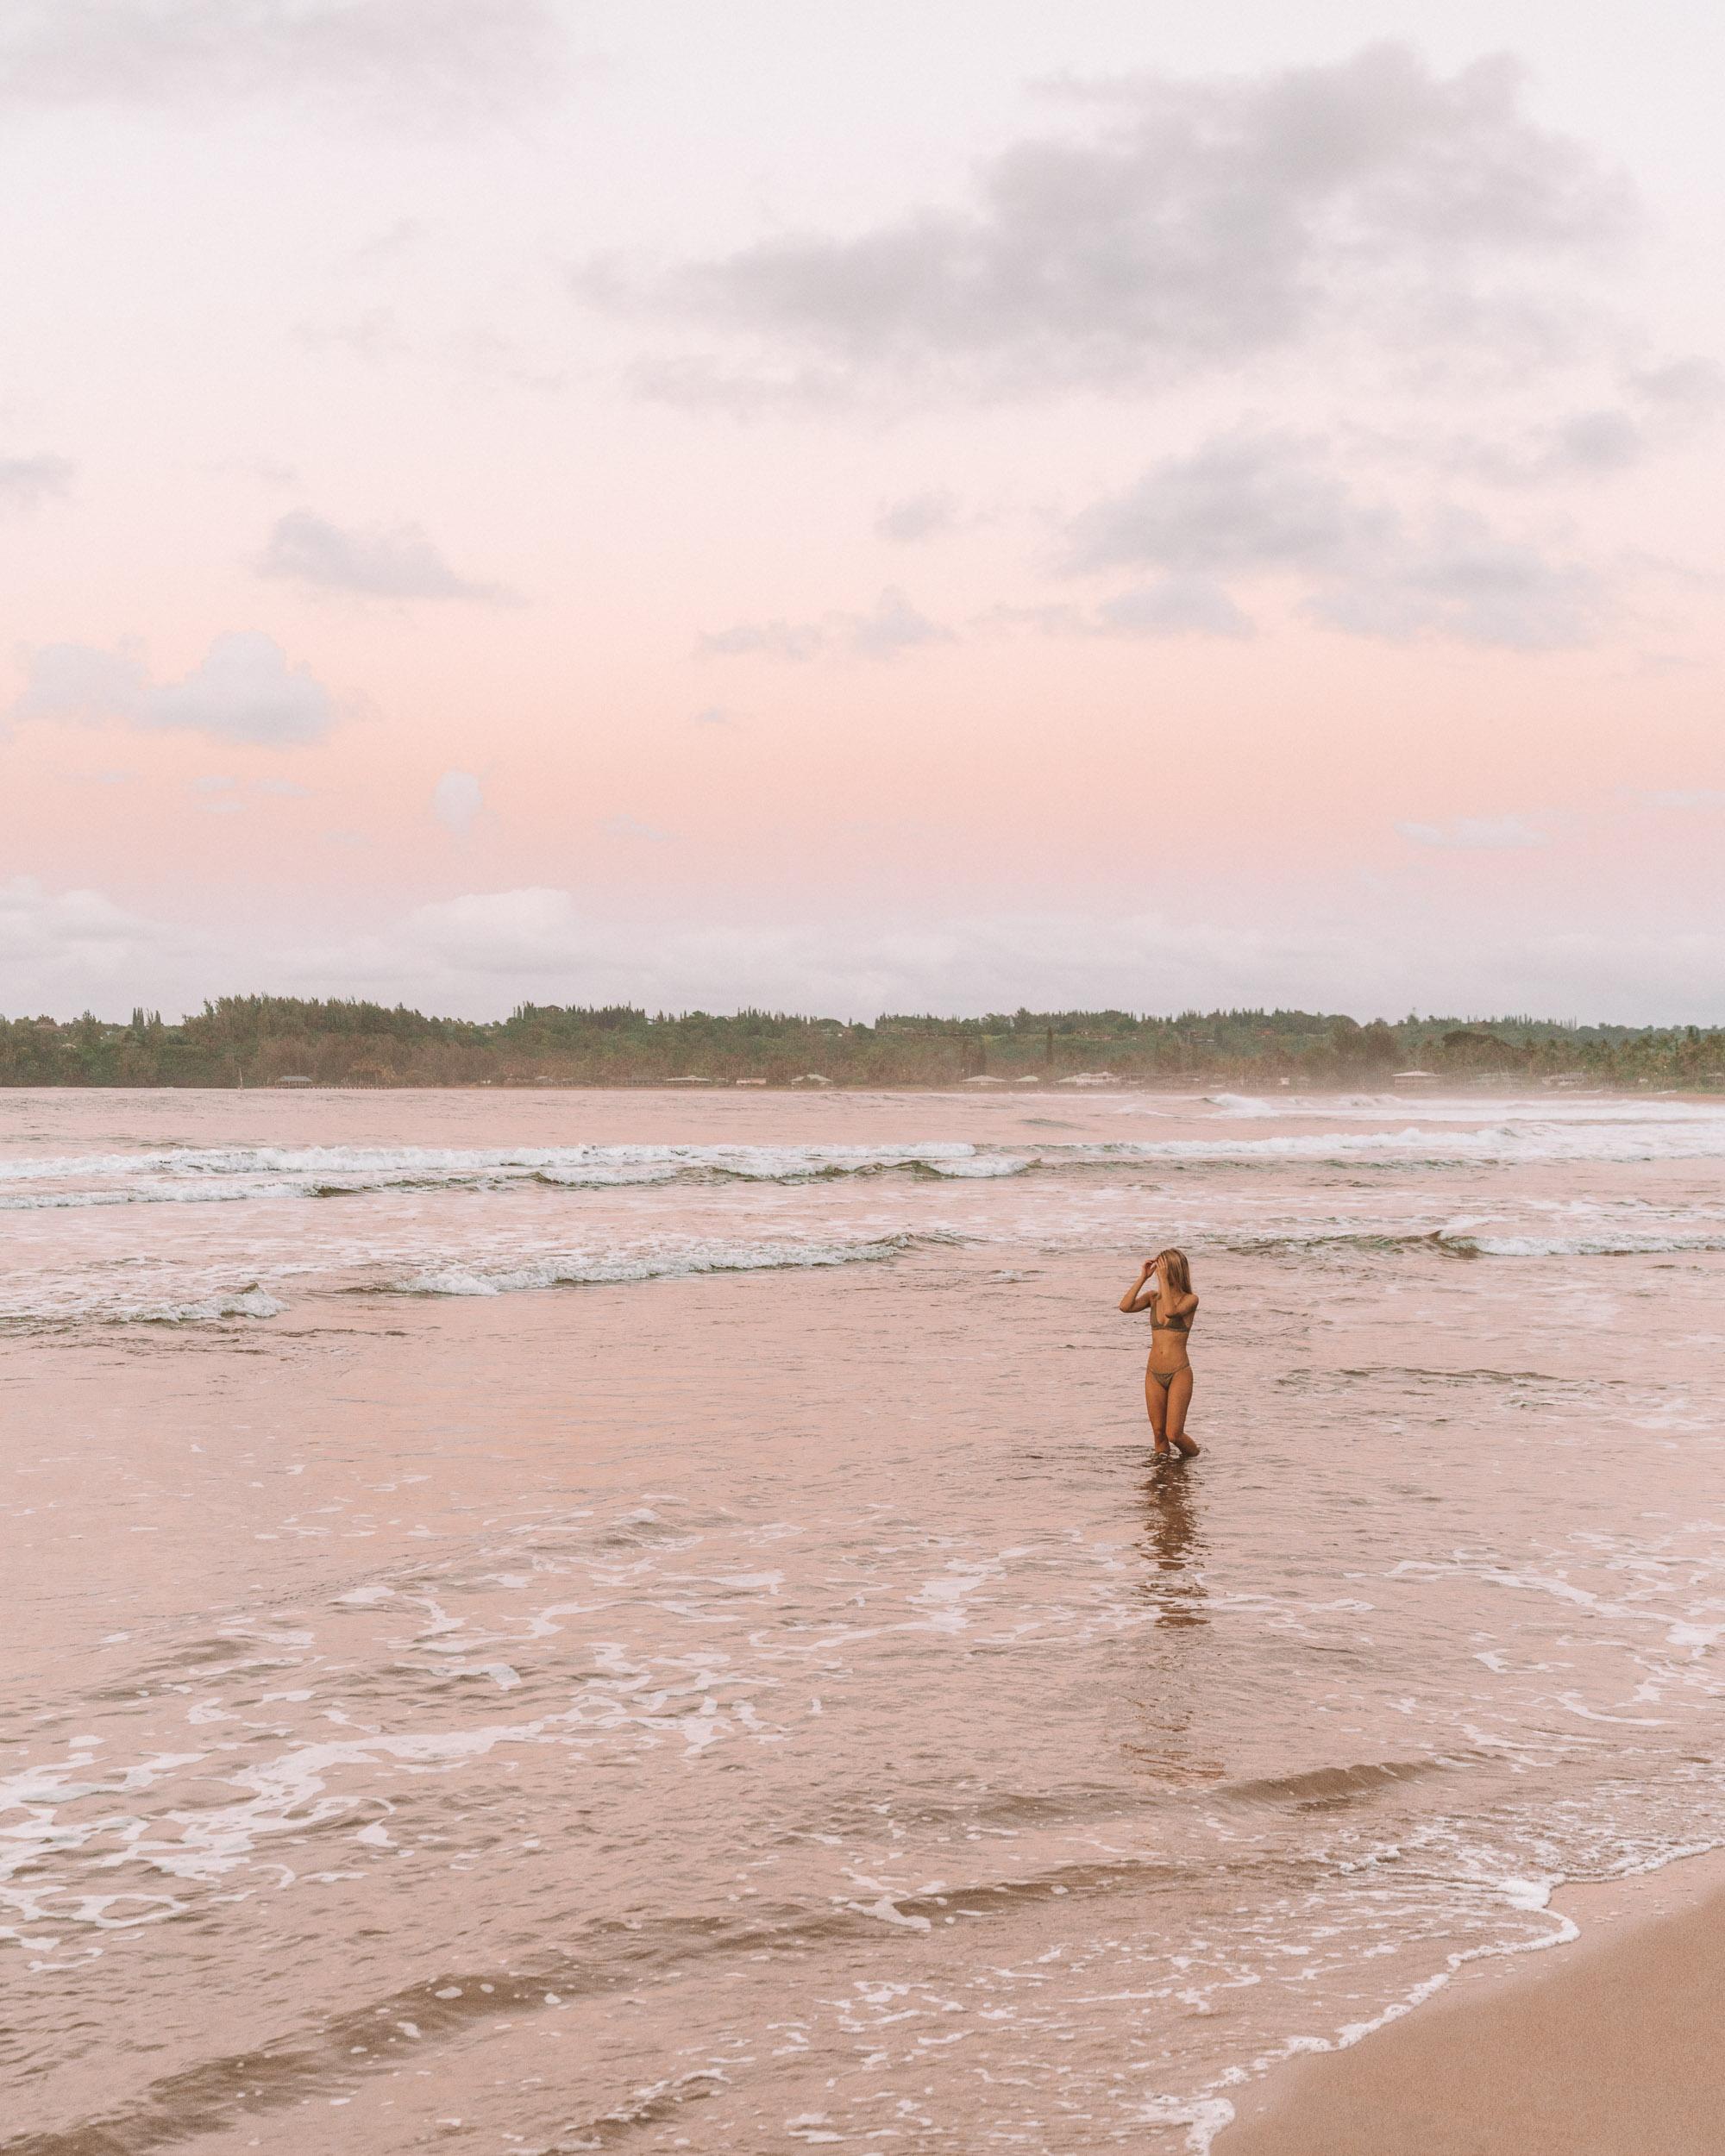 Hanalei Bay Beach at Sunset in Kauai via Find Us Lost